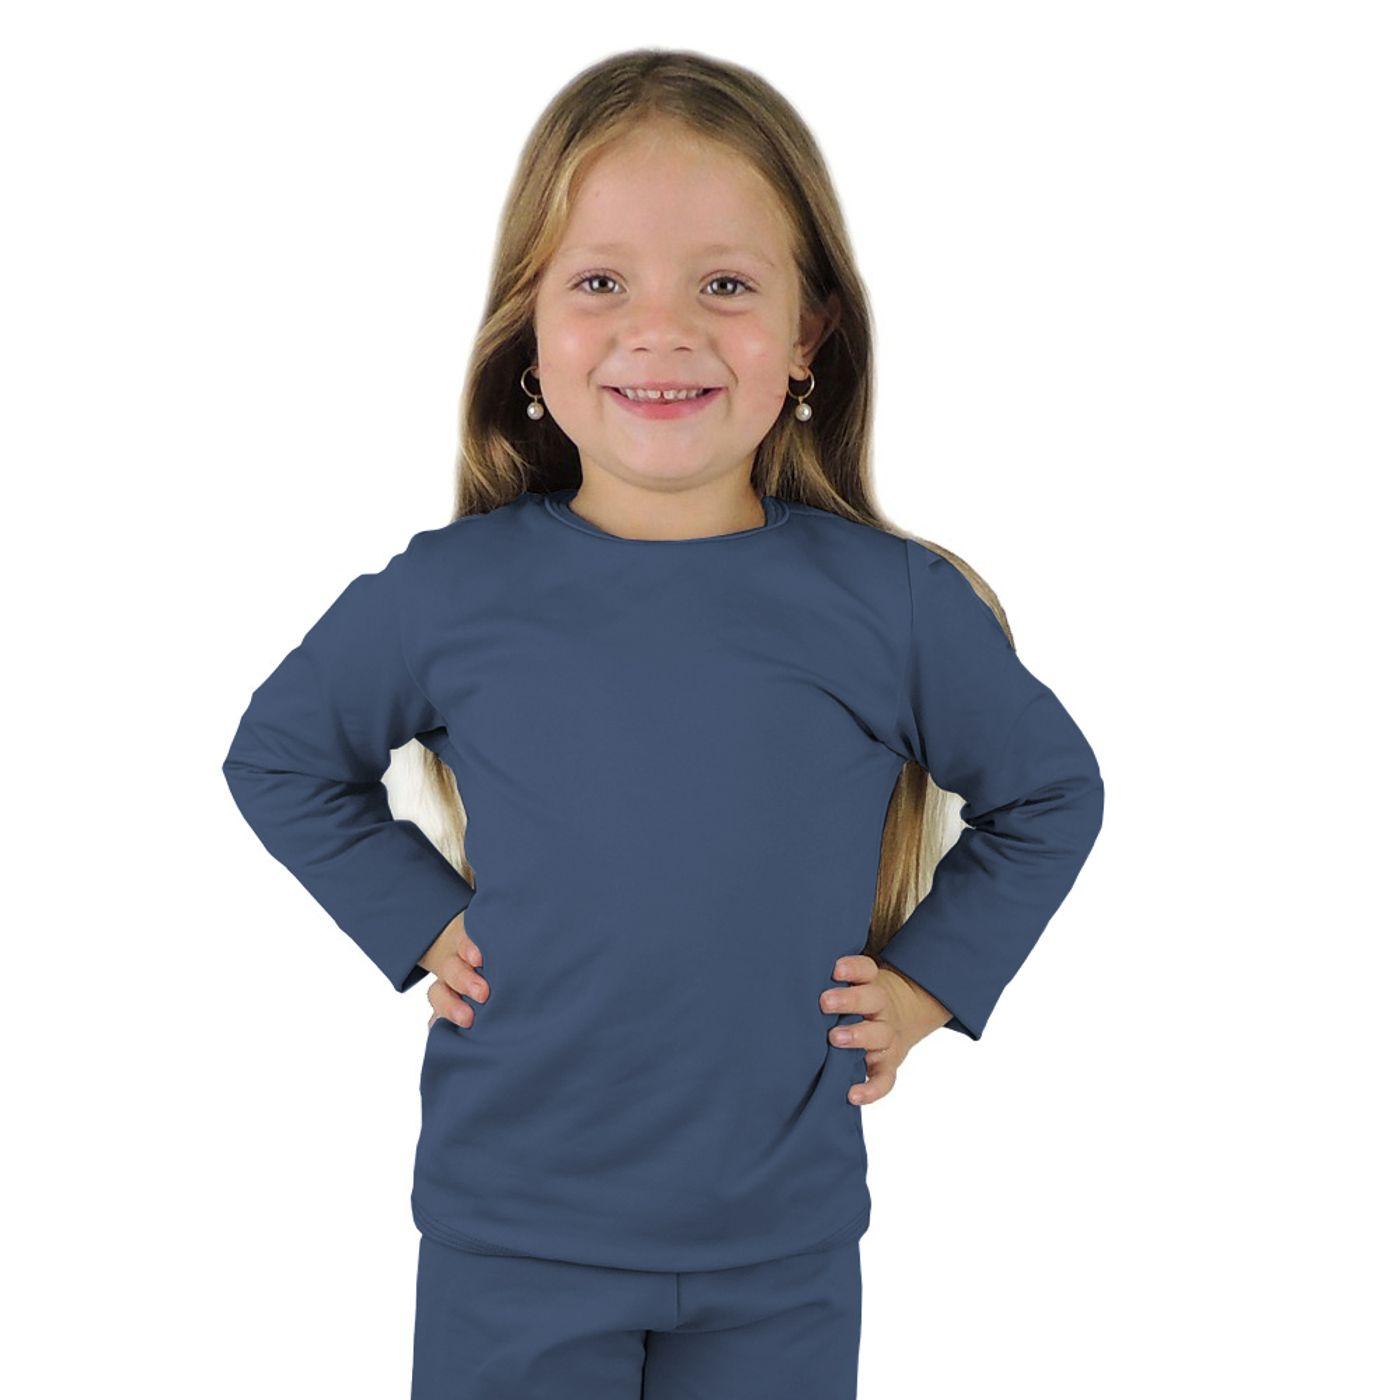 b83efcda9 Blusa termica infantil segunda pele azul marinho - fieroshop